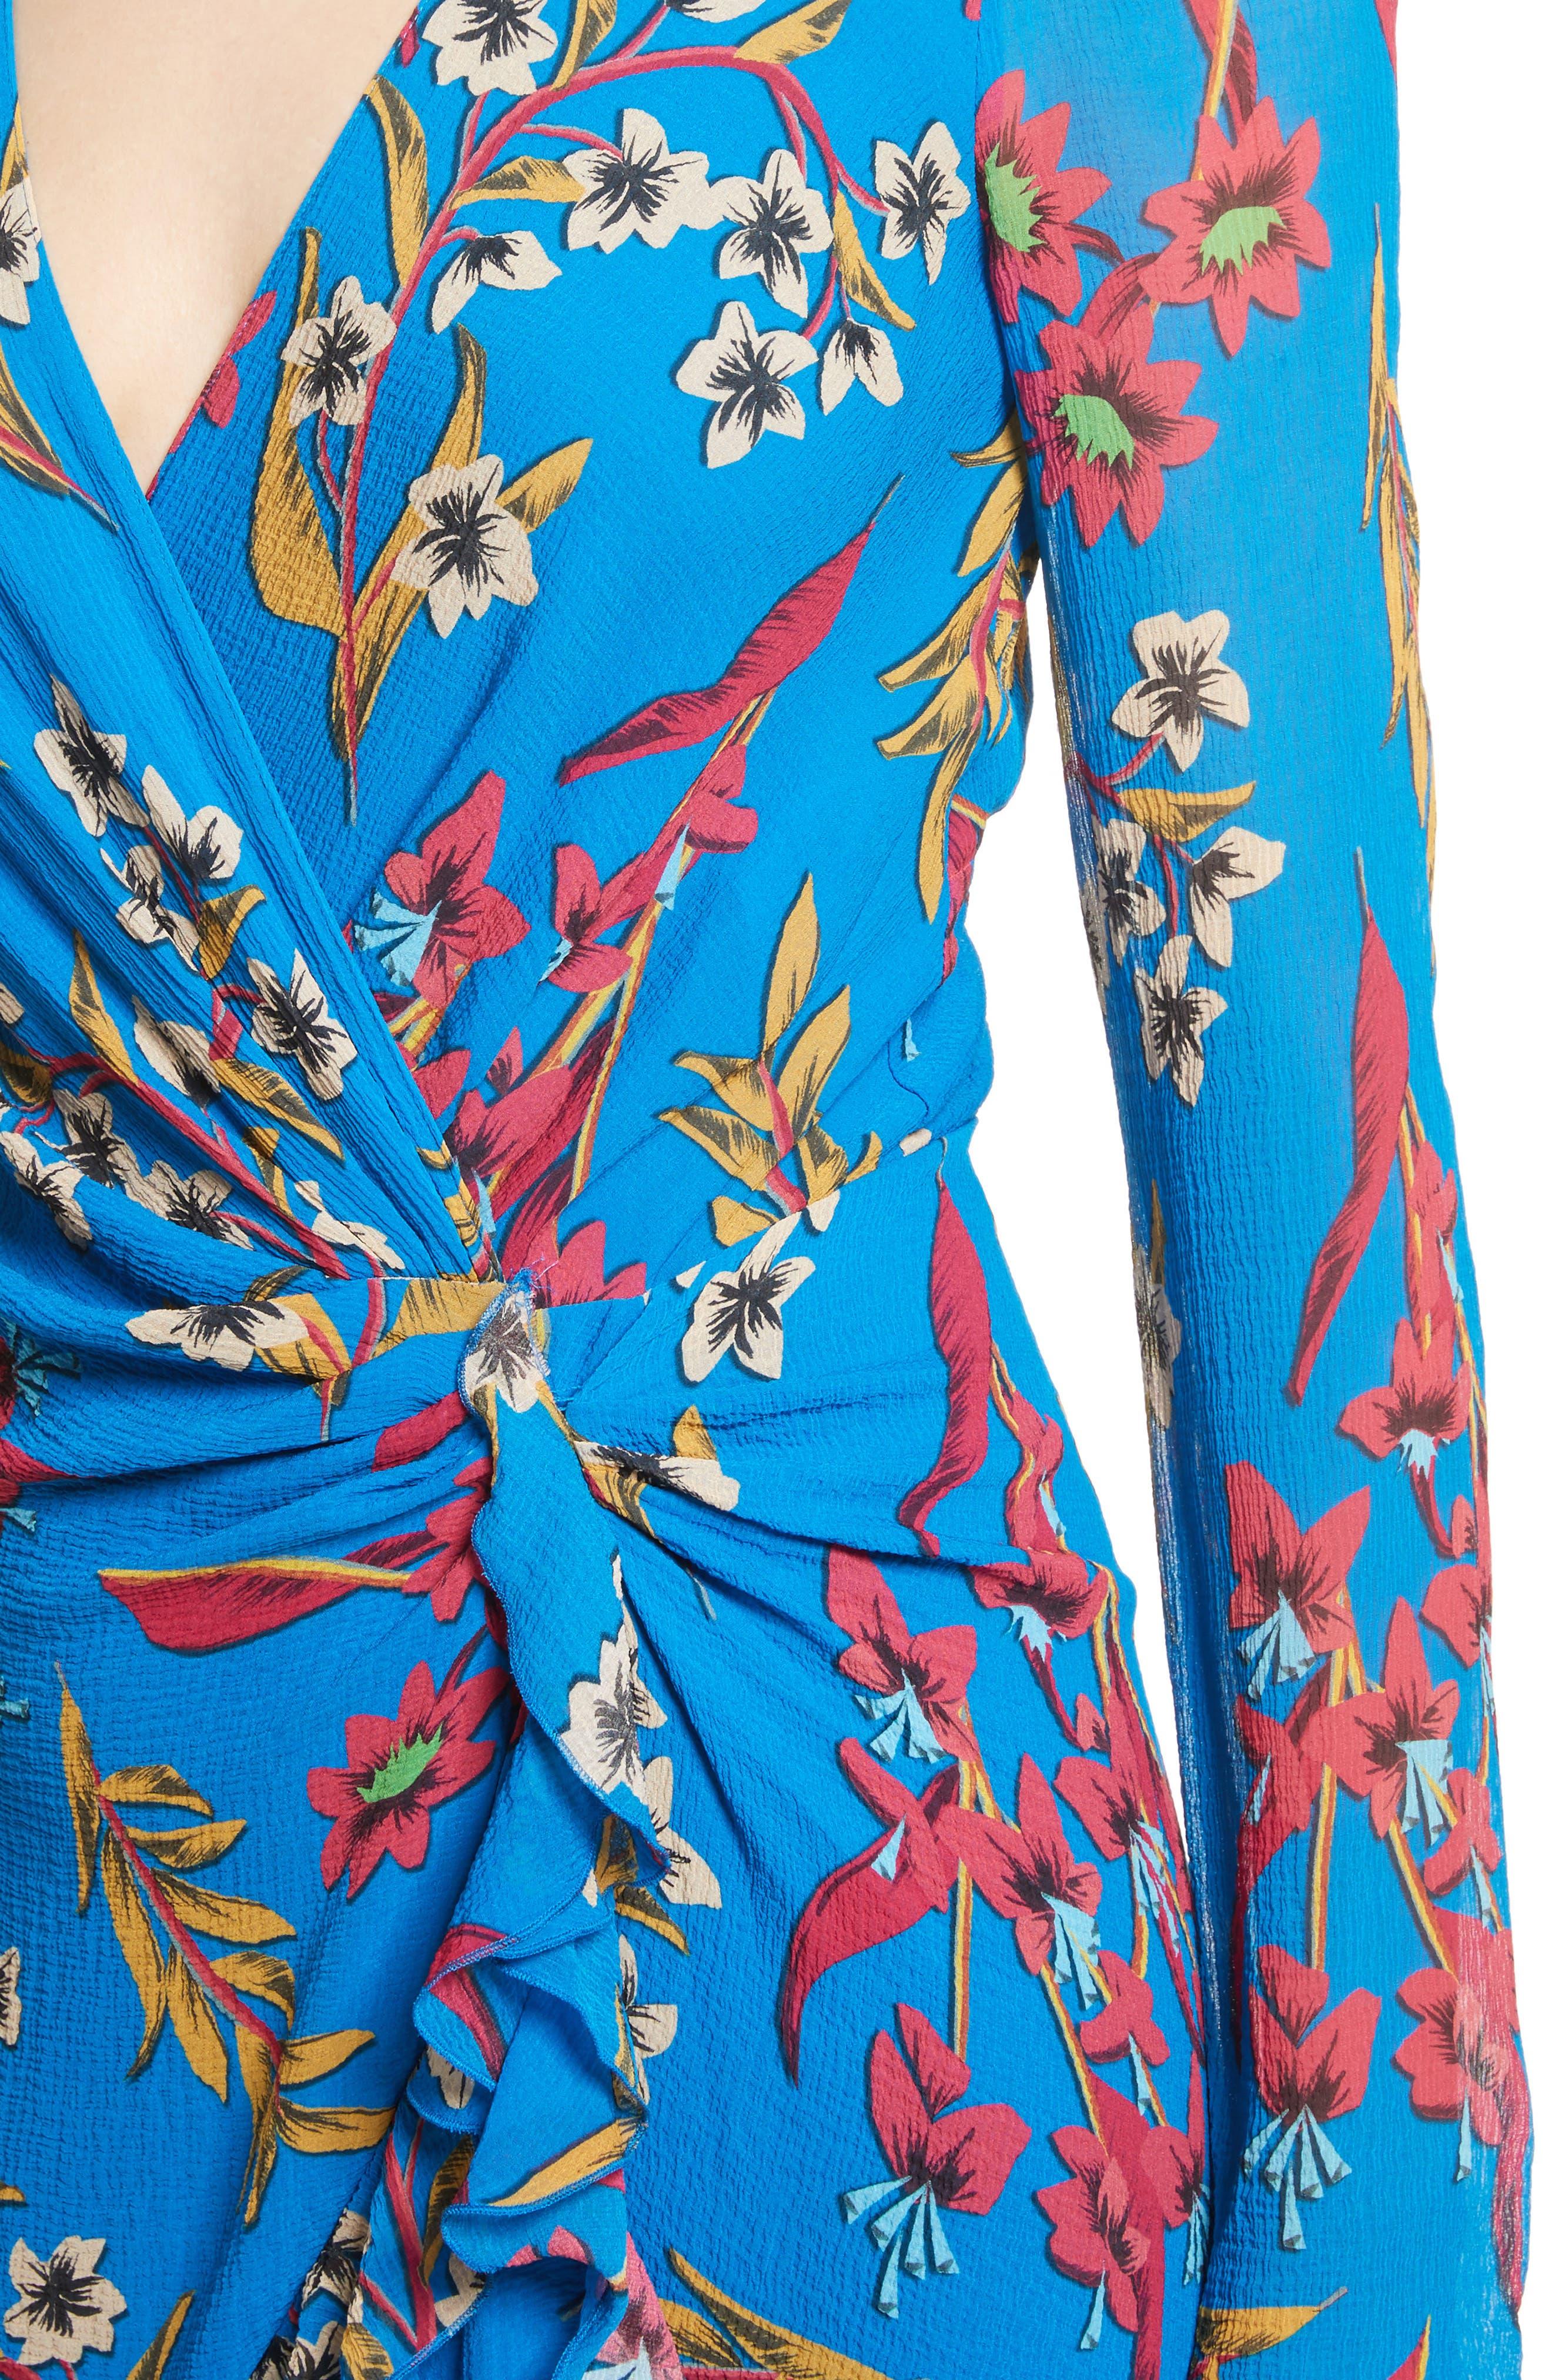 Jungle Floral Print Asymmetrical Ruffle Dress,                             Alternate thumbnail 4, color,                             410